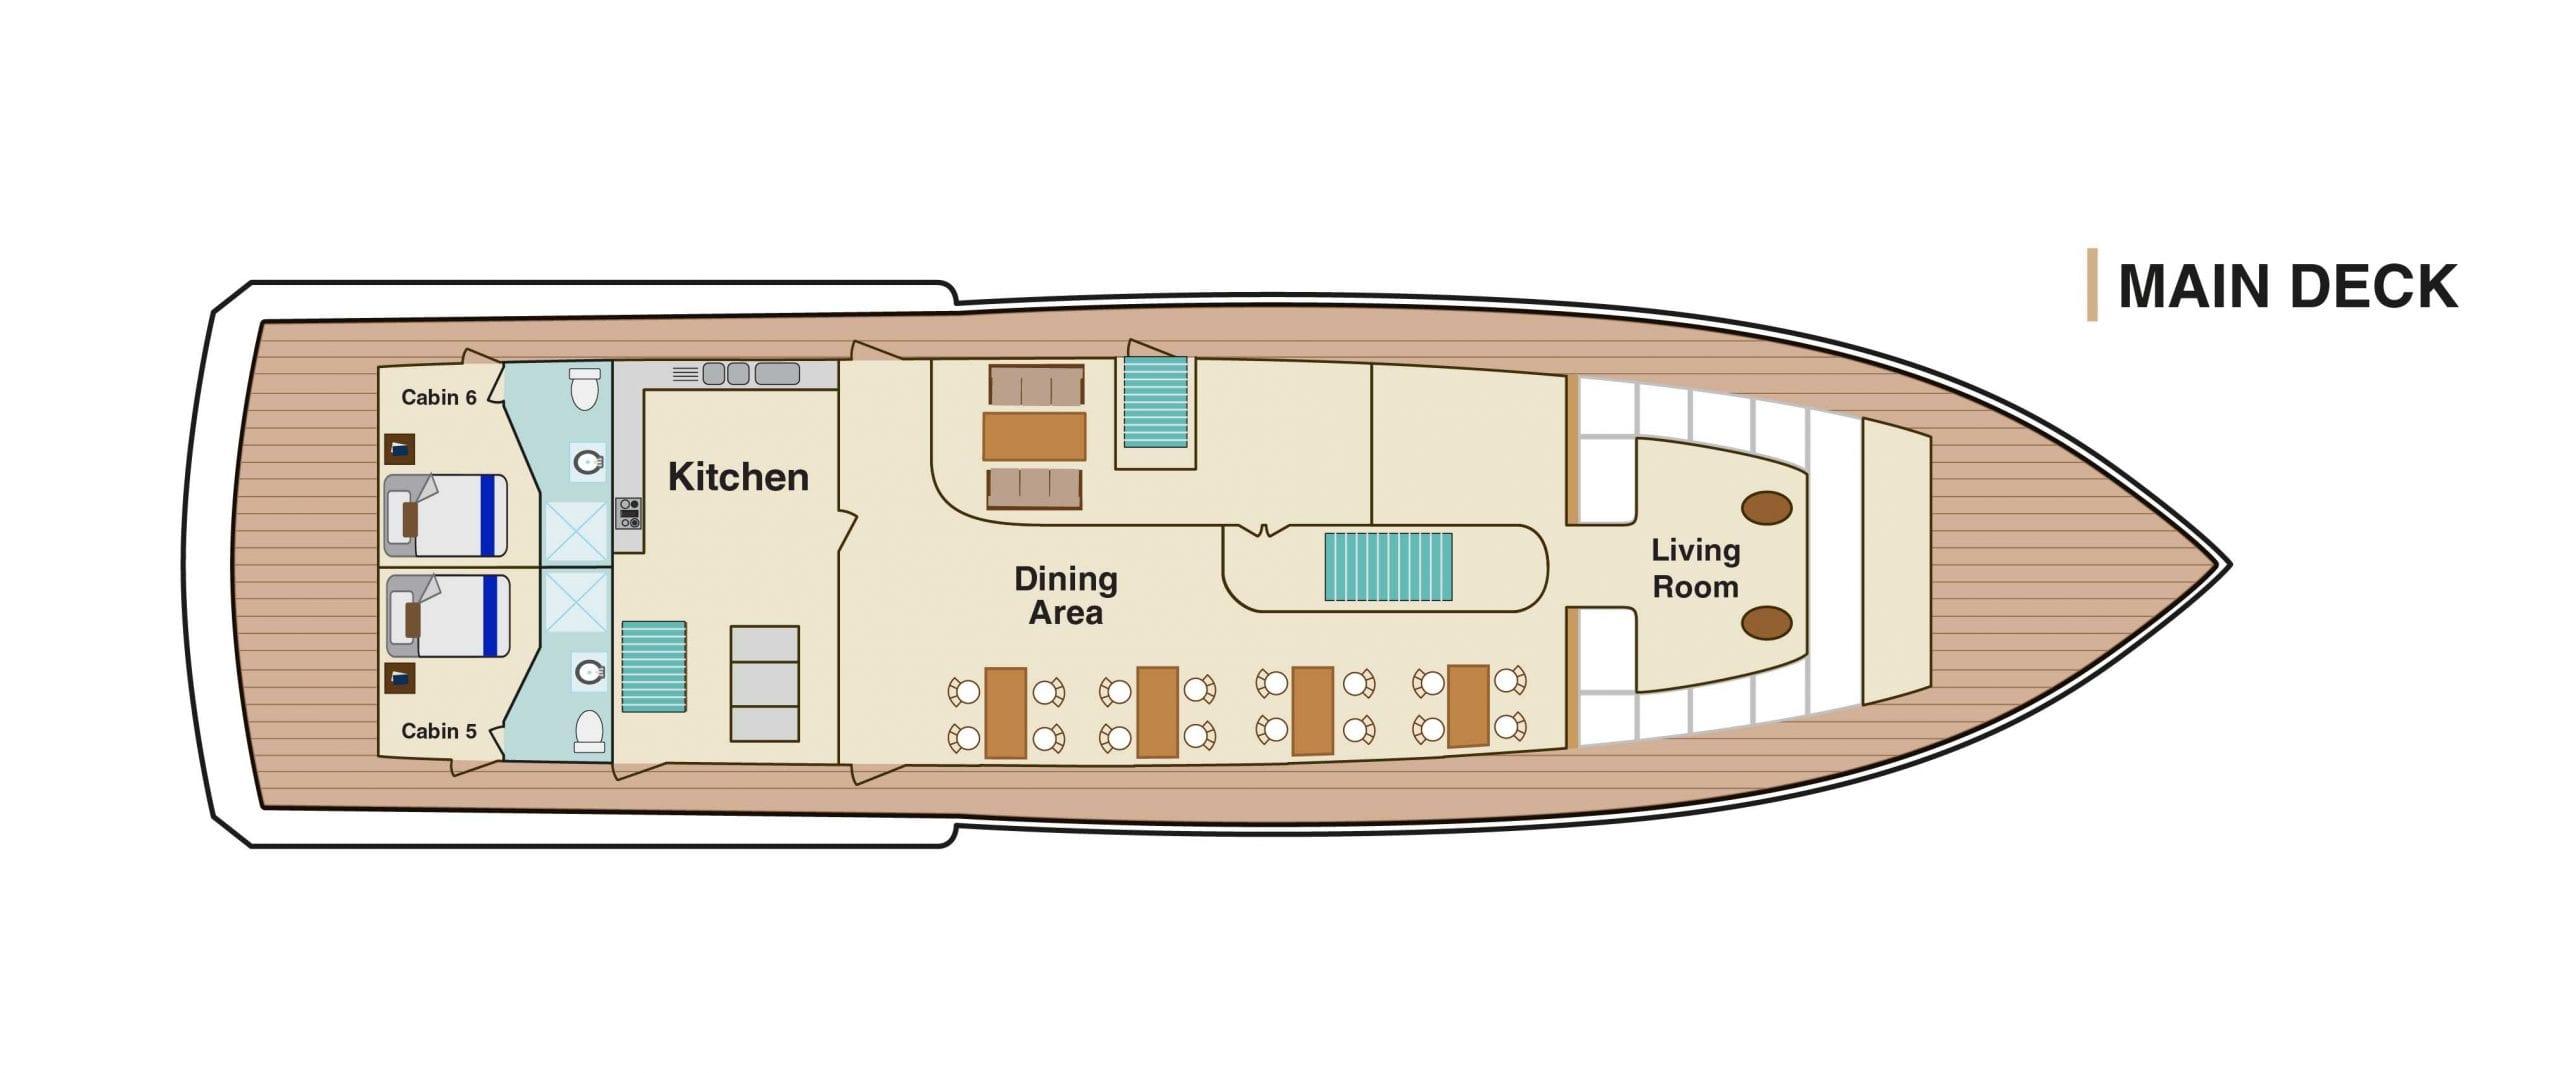 Bonita Yacht Galapagos - Main Deck Plan